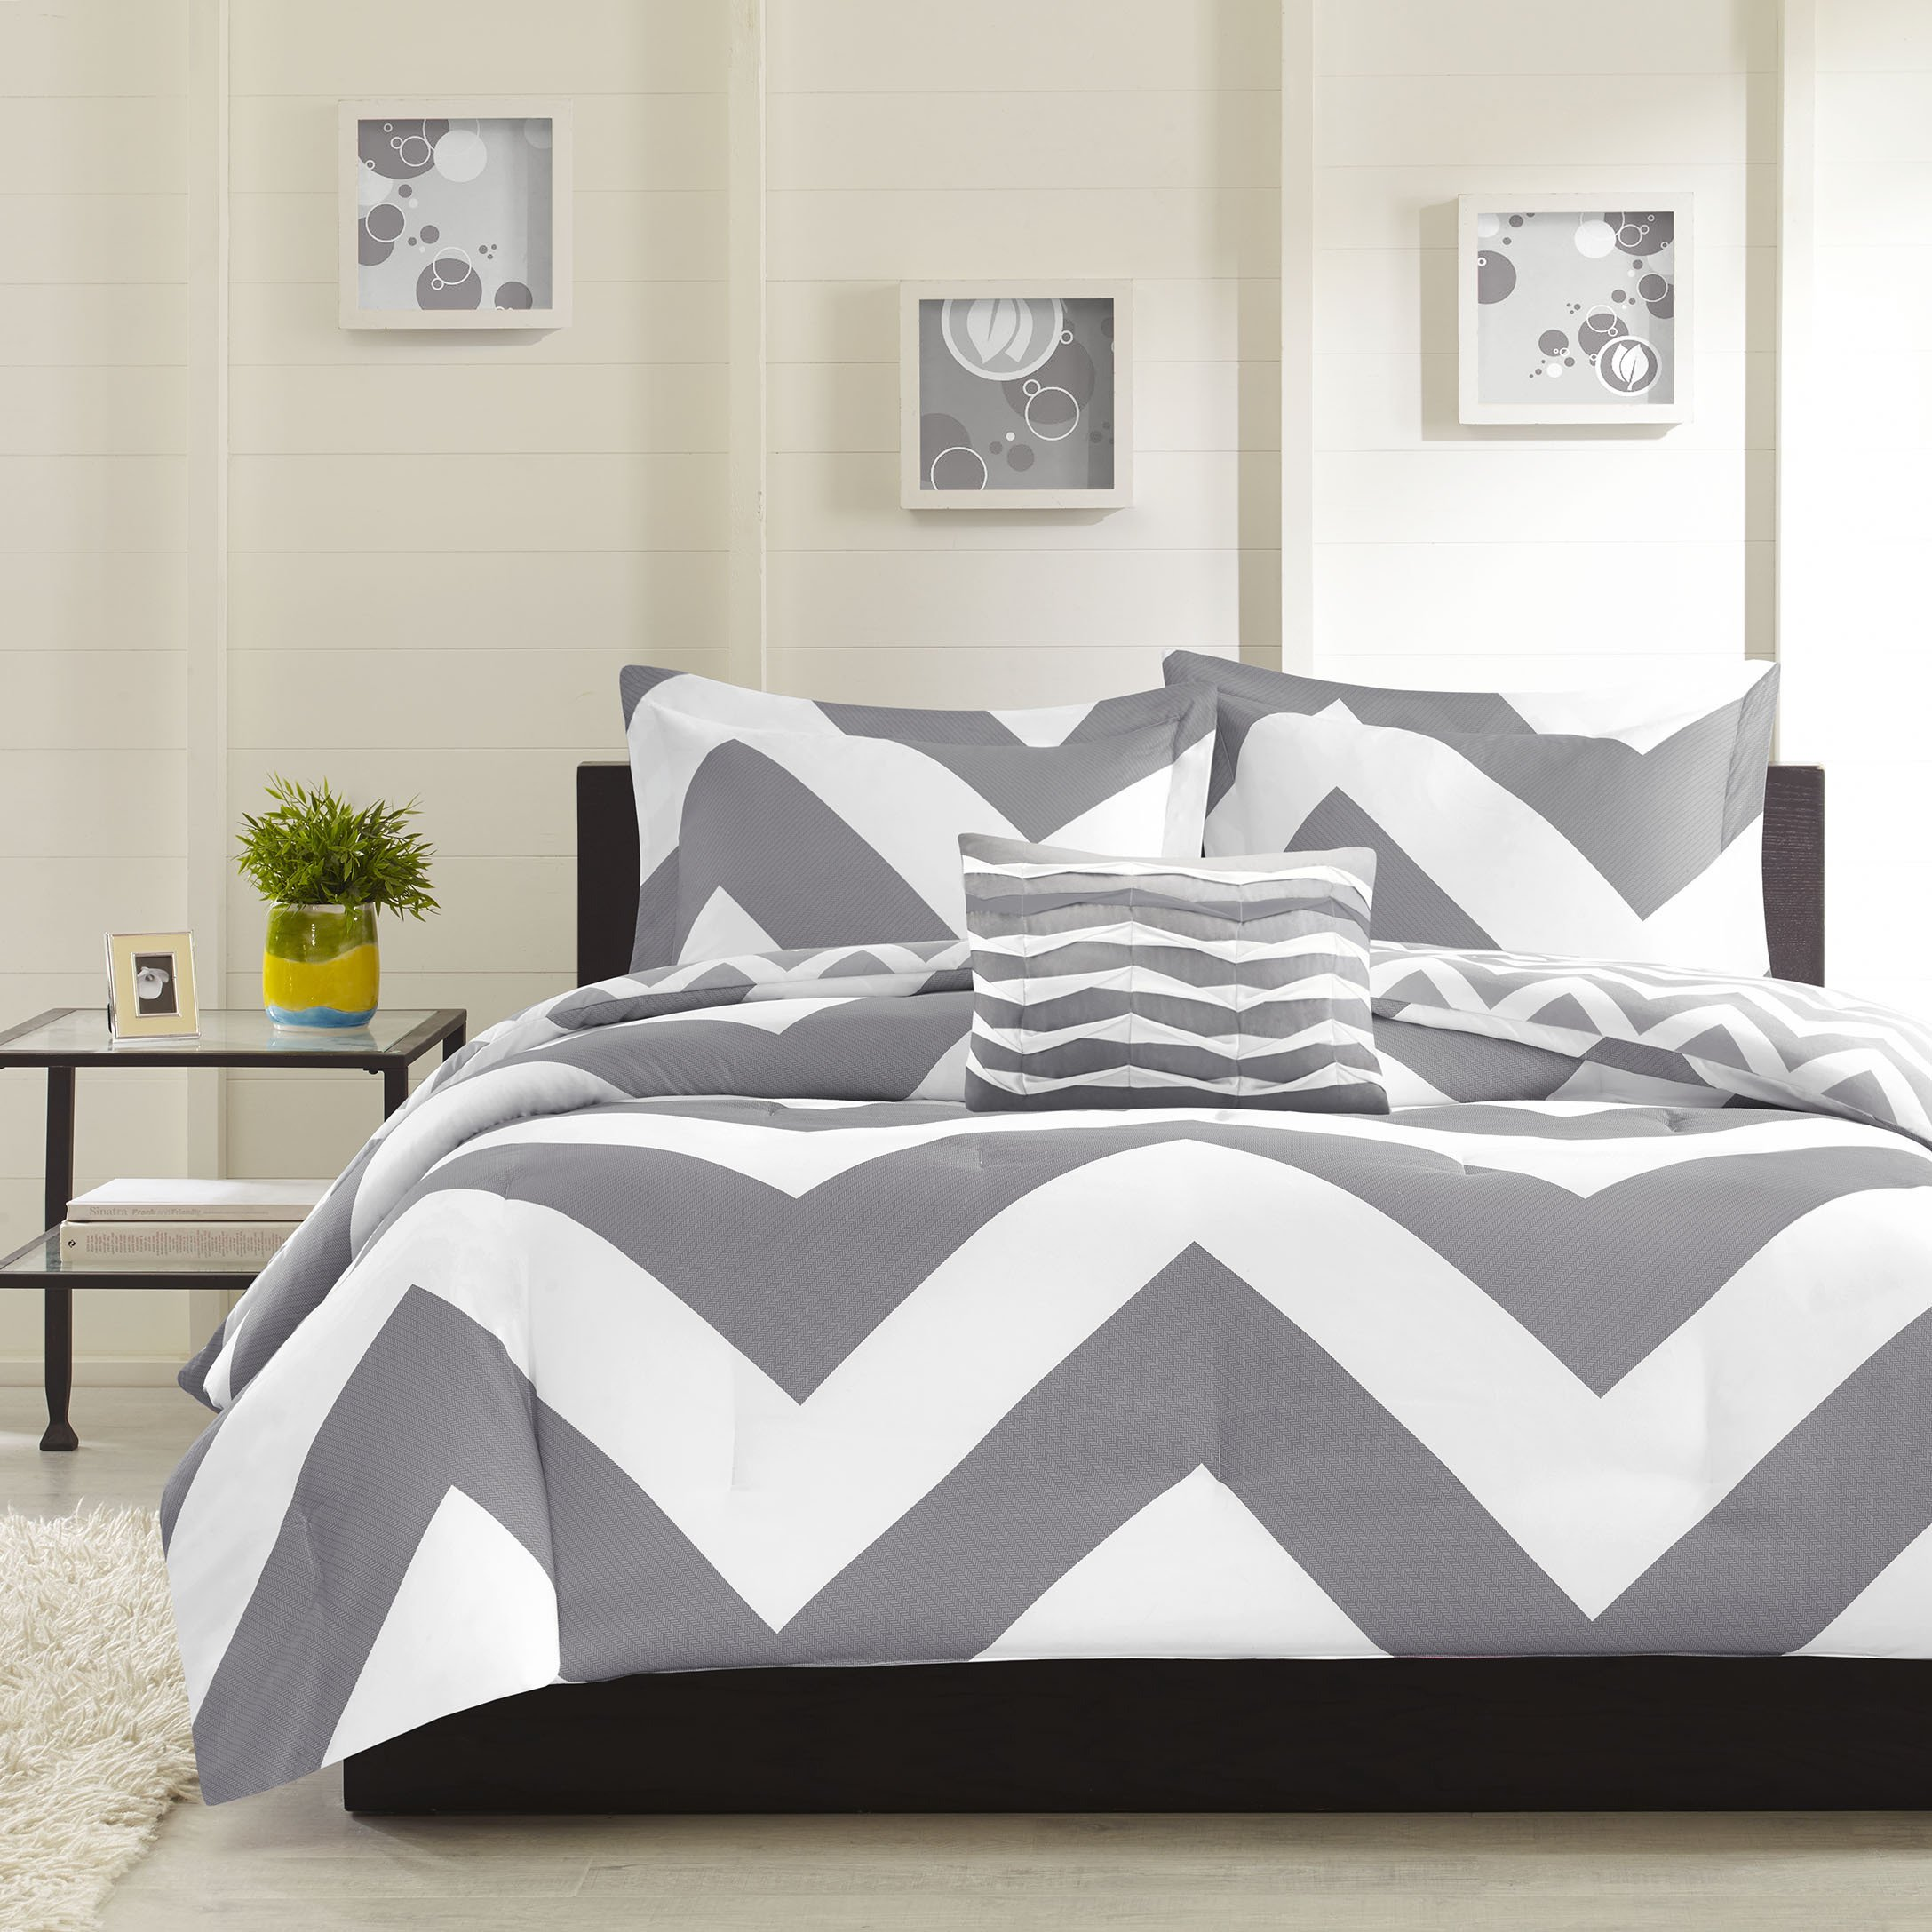 4 Piece Grey Chevron Comforter Full Queen Set, Stylish ZigZag Stipes, Horizontal Zig Zag Stripe Themed Bedding, Modern Geometric V Shaped Line Striped Pattern, White Gray